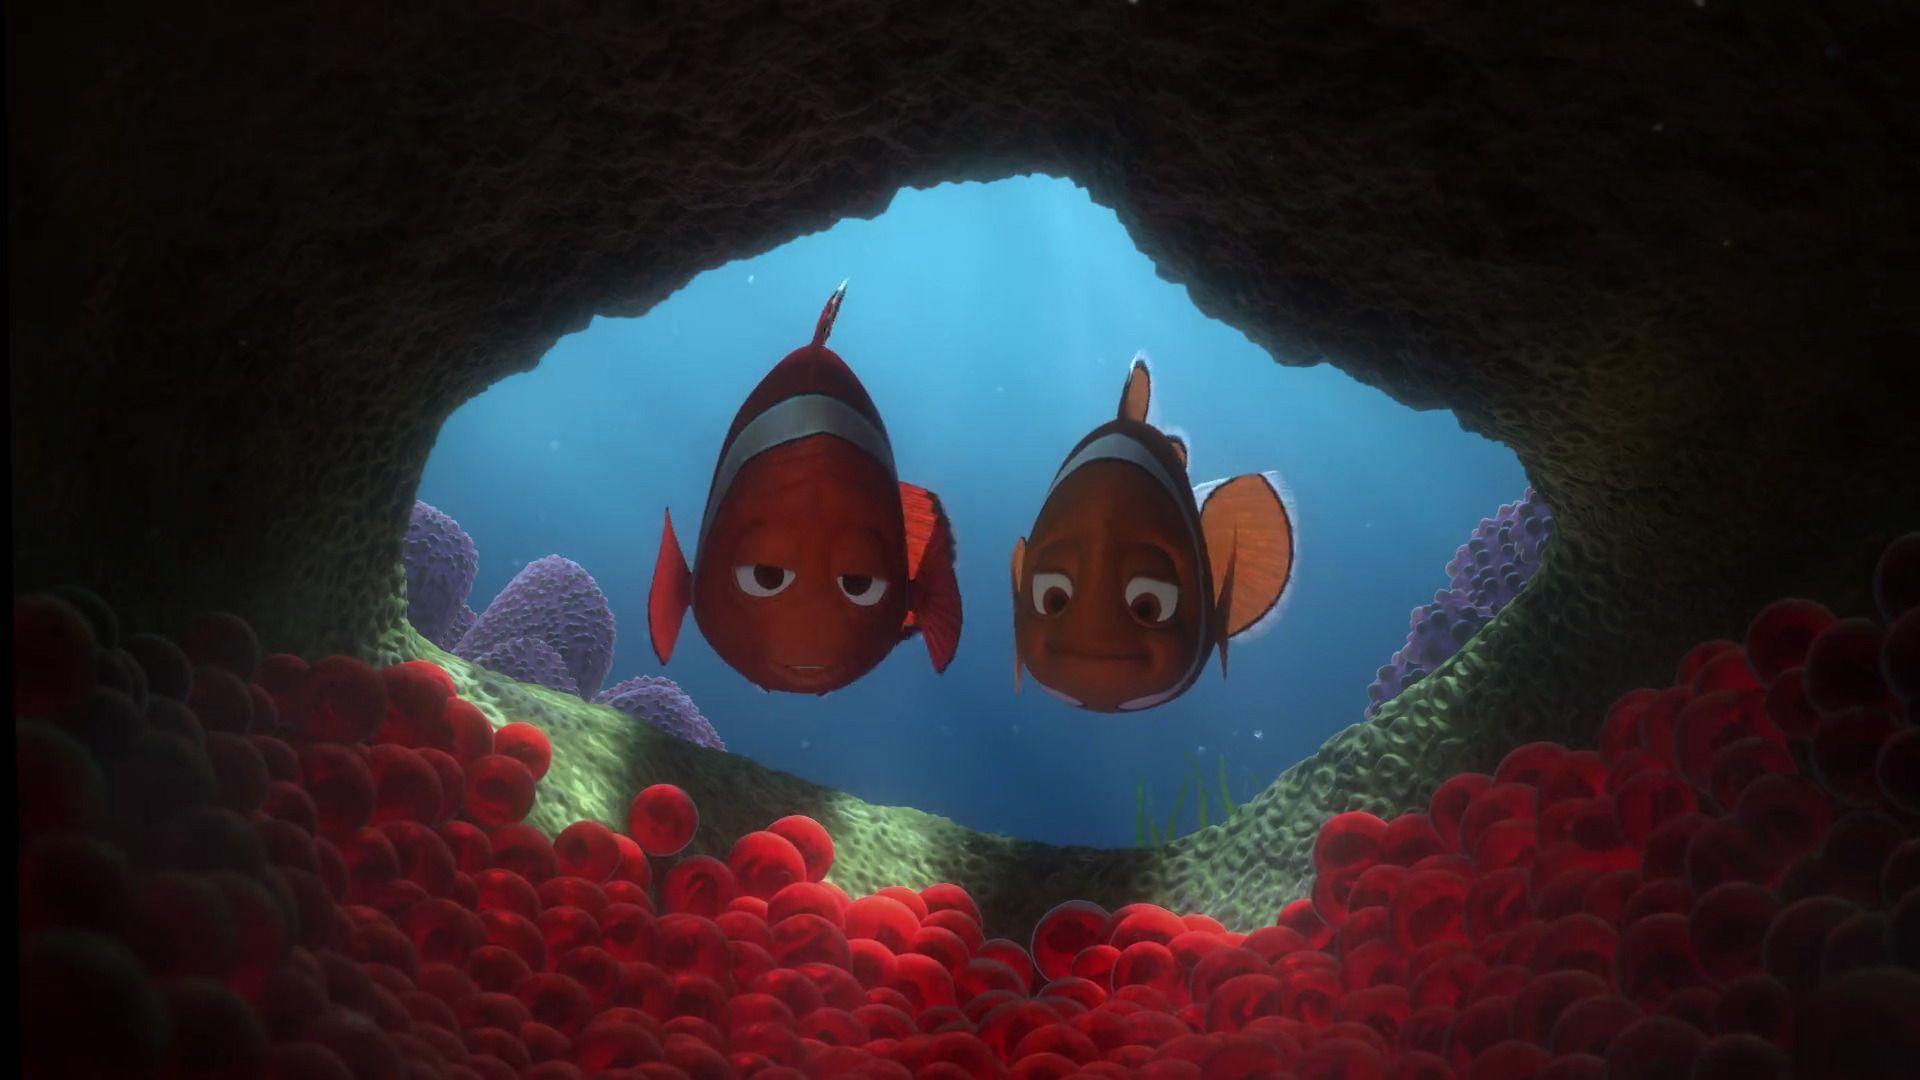 Finding Nemo Disney Walt Disney Movies Fish Animation: Screencap Gallery For Finding Nemo (2003) (1080p Bluray